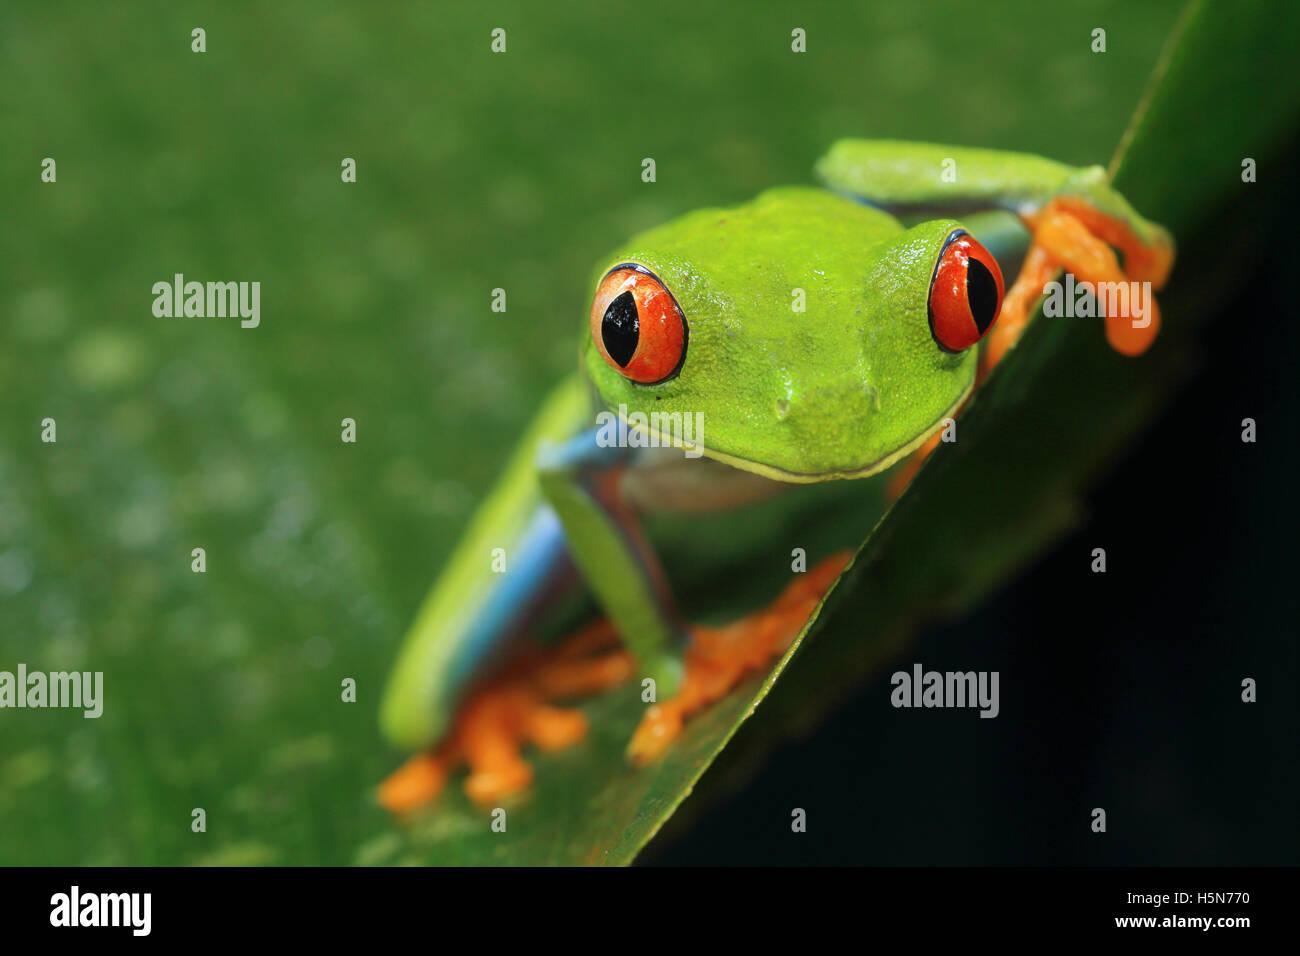 Red-eyed Tree Frog (Agalychnis callidryas) in caribbean rainforest. Tortuguero National Park, Costa Rica. Stock Photo